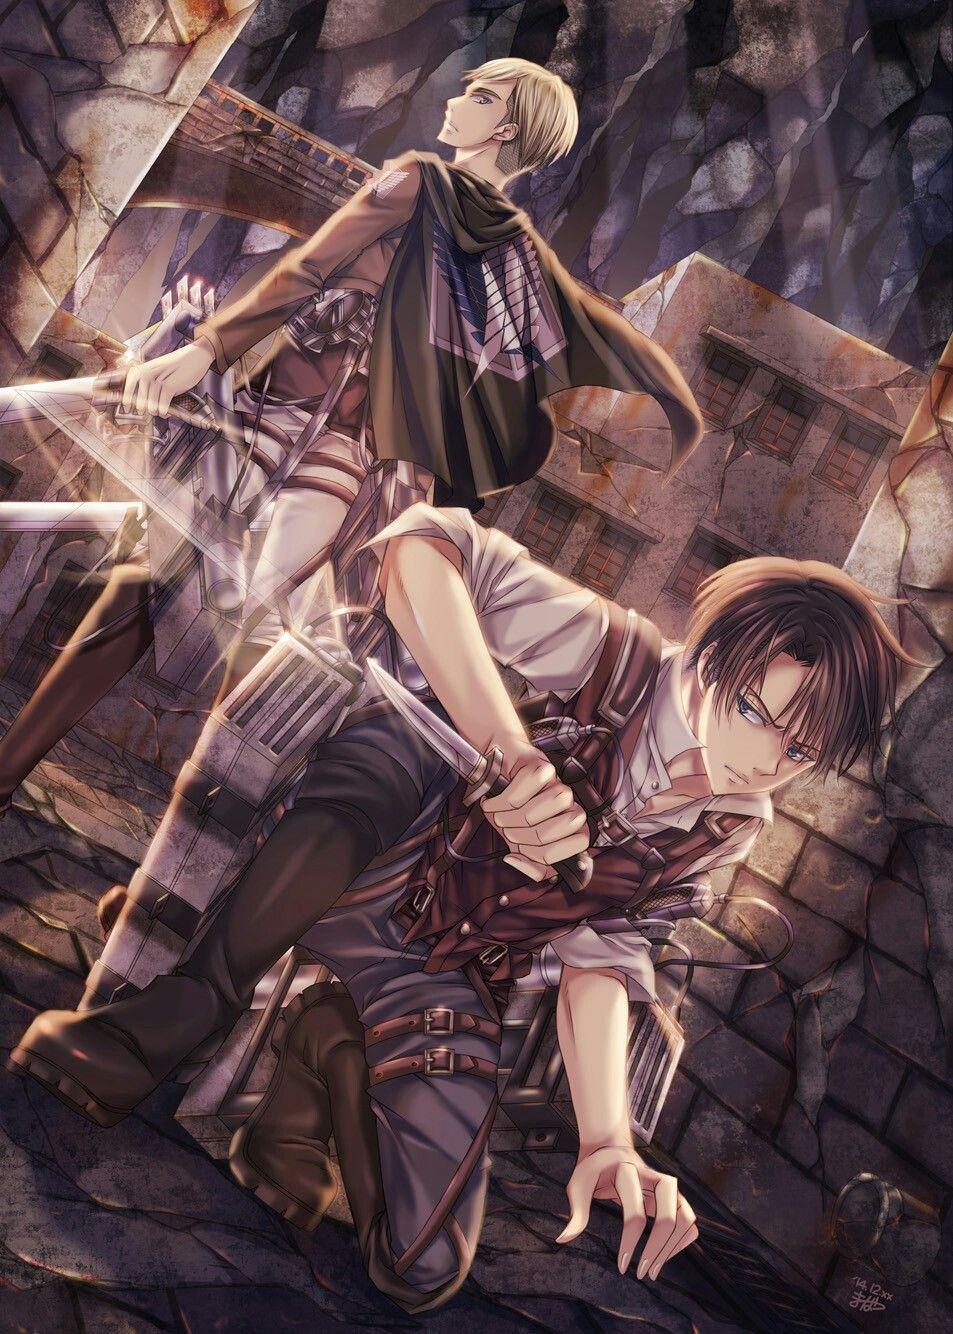 d829910e490a Erwin & Levi | AoT | Anime Love | Attack on titan levi, Attack on ...